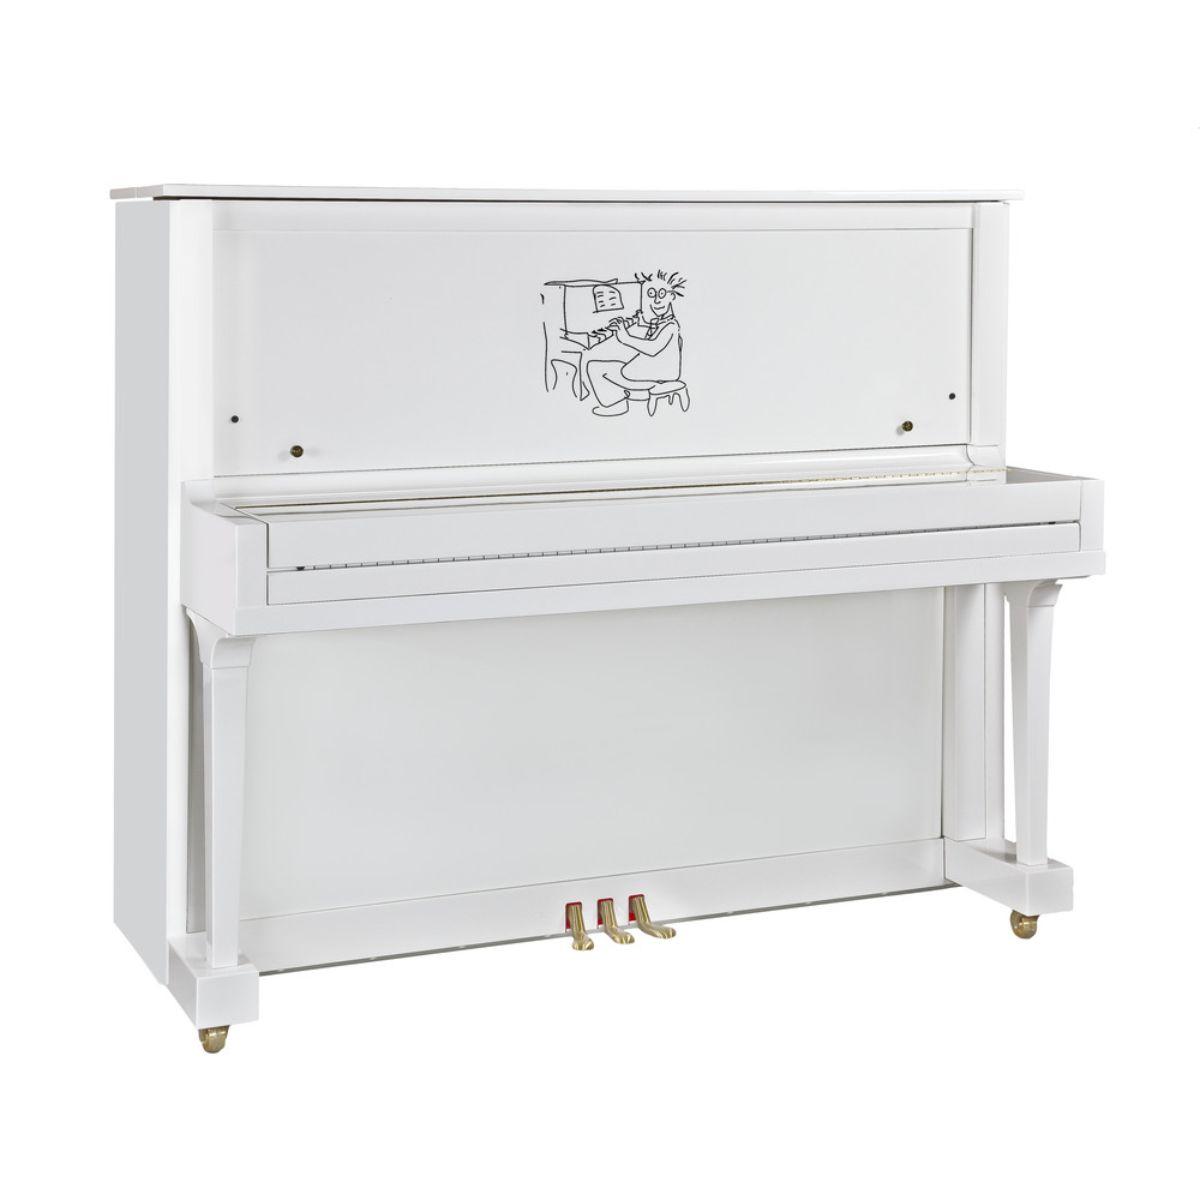 john_lennon_pianoforte_steinway_limited_edition